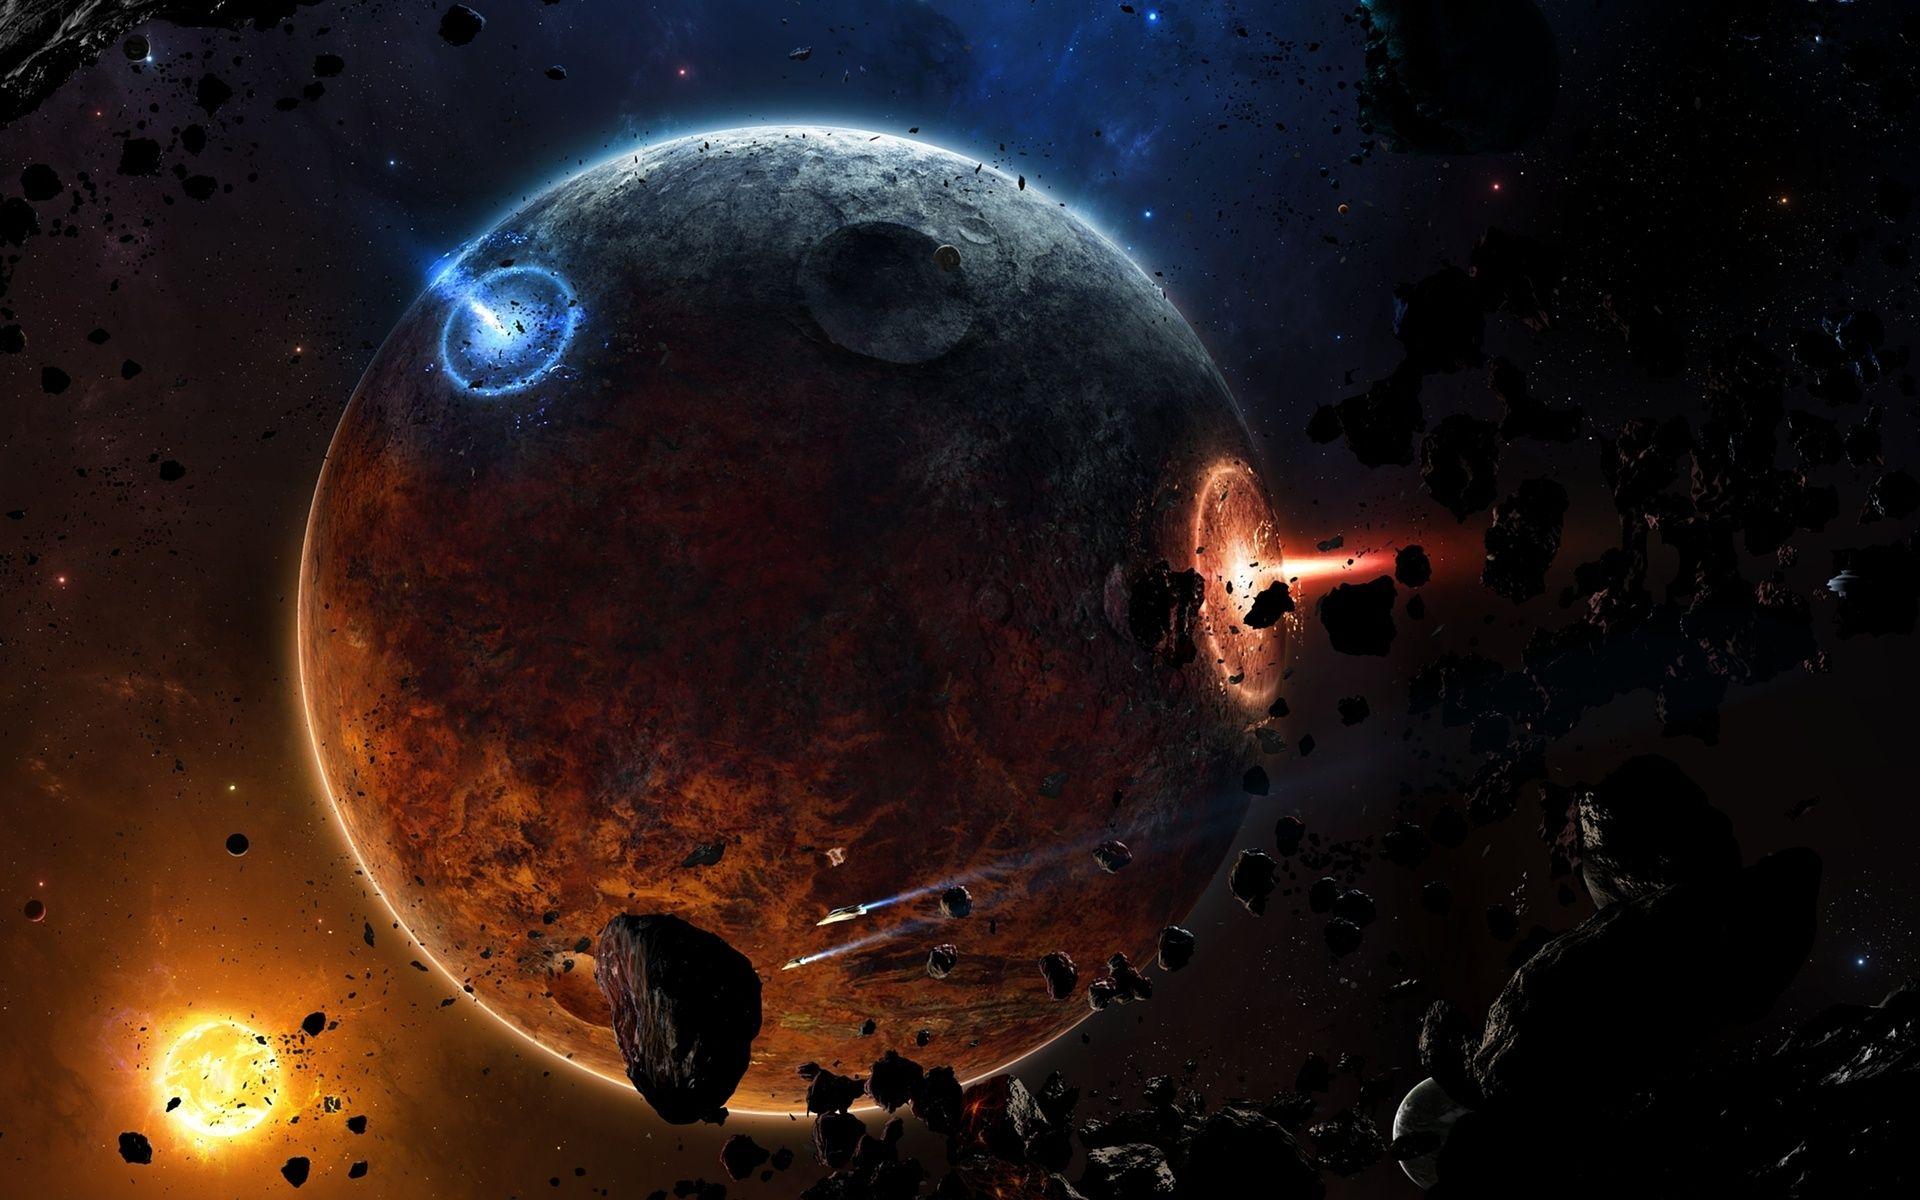 Sci Fi Spaceship Planet Fire Fi Fire Planet Sci Spaceship Planets Wallpaper Wallpaper Space Space Artwork